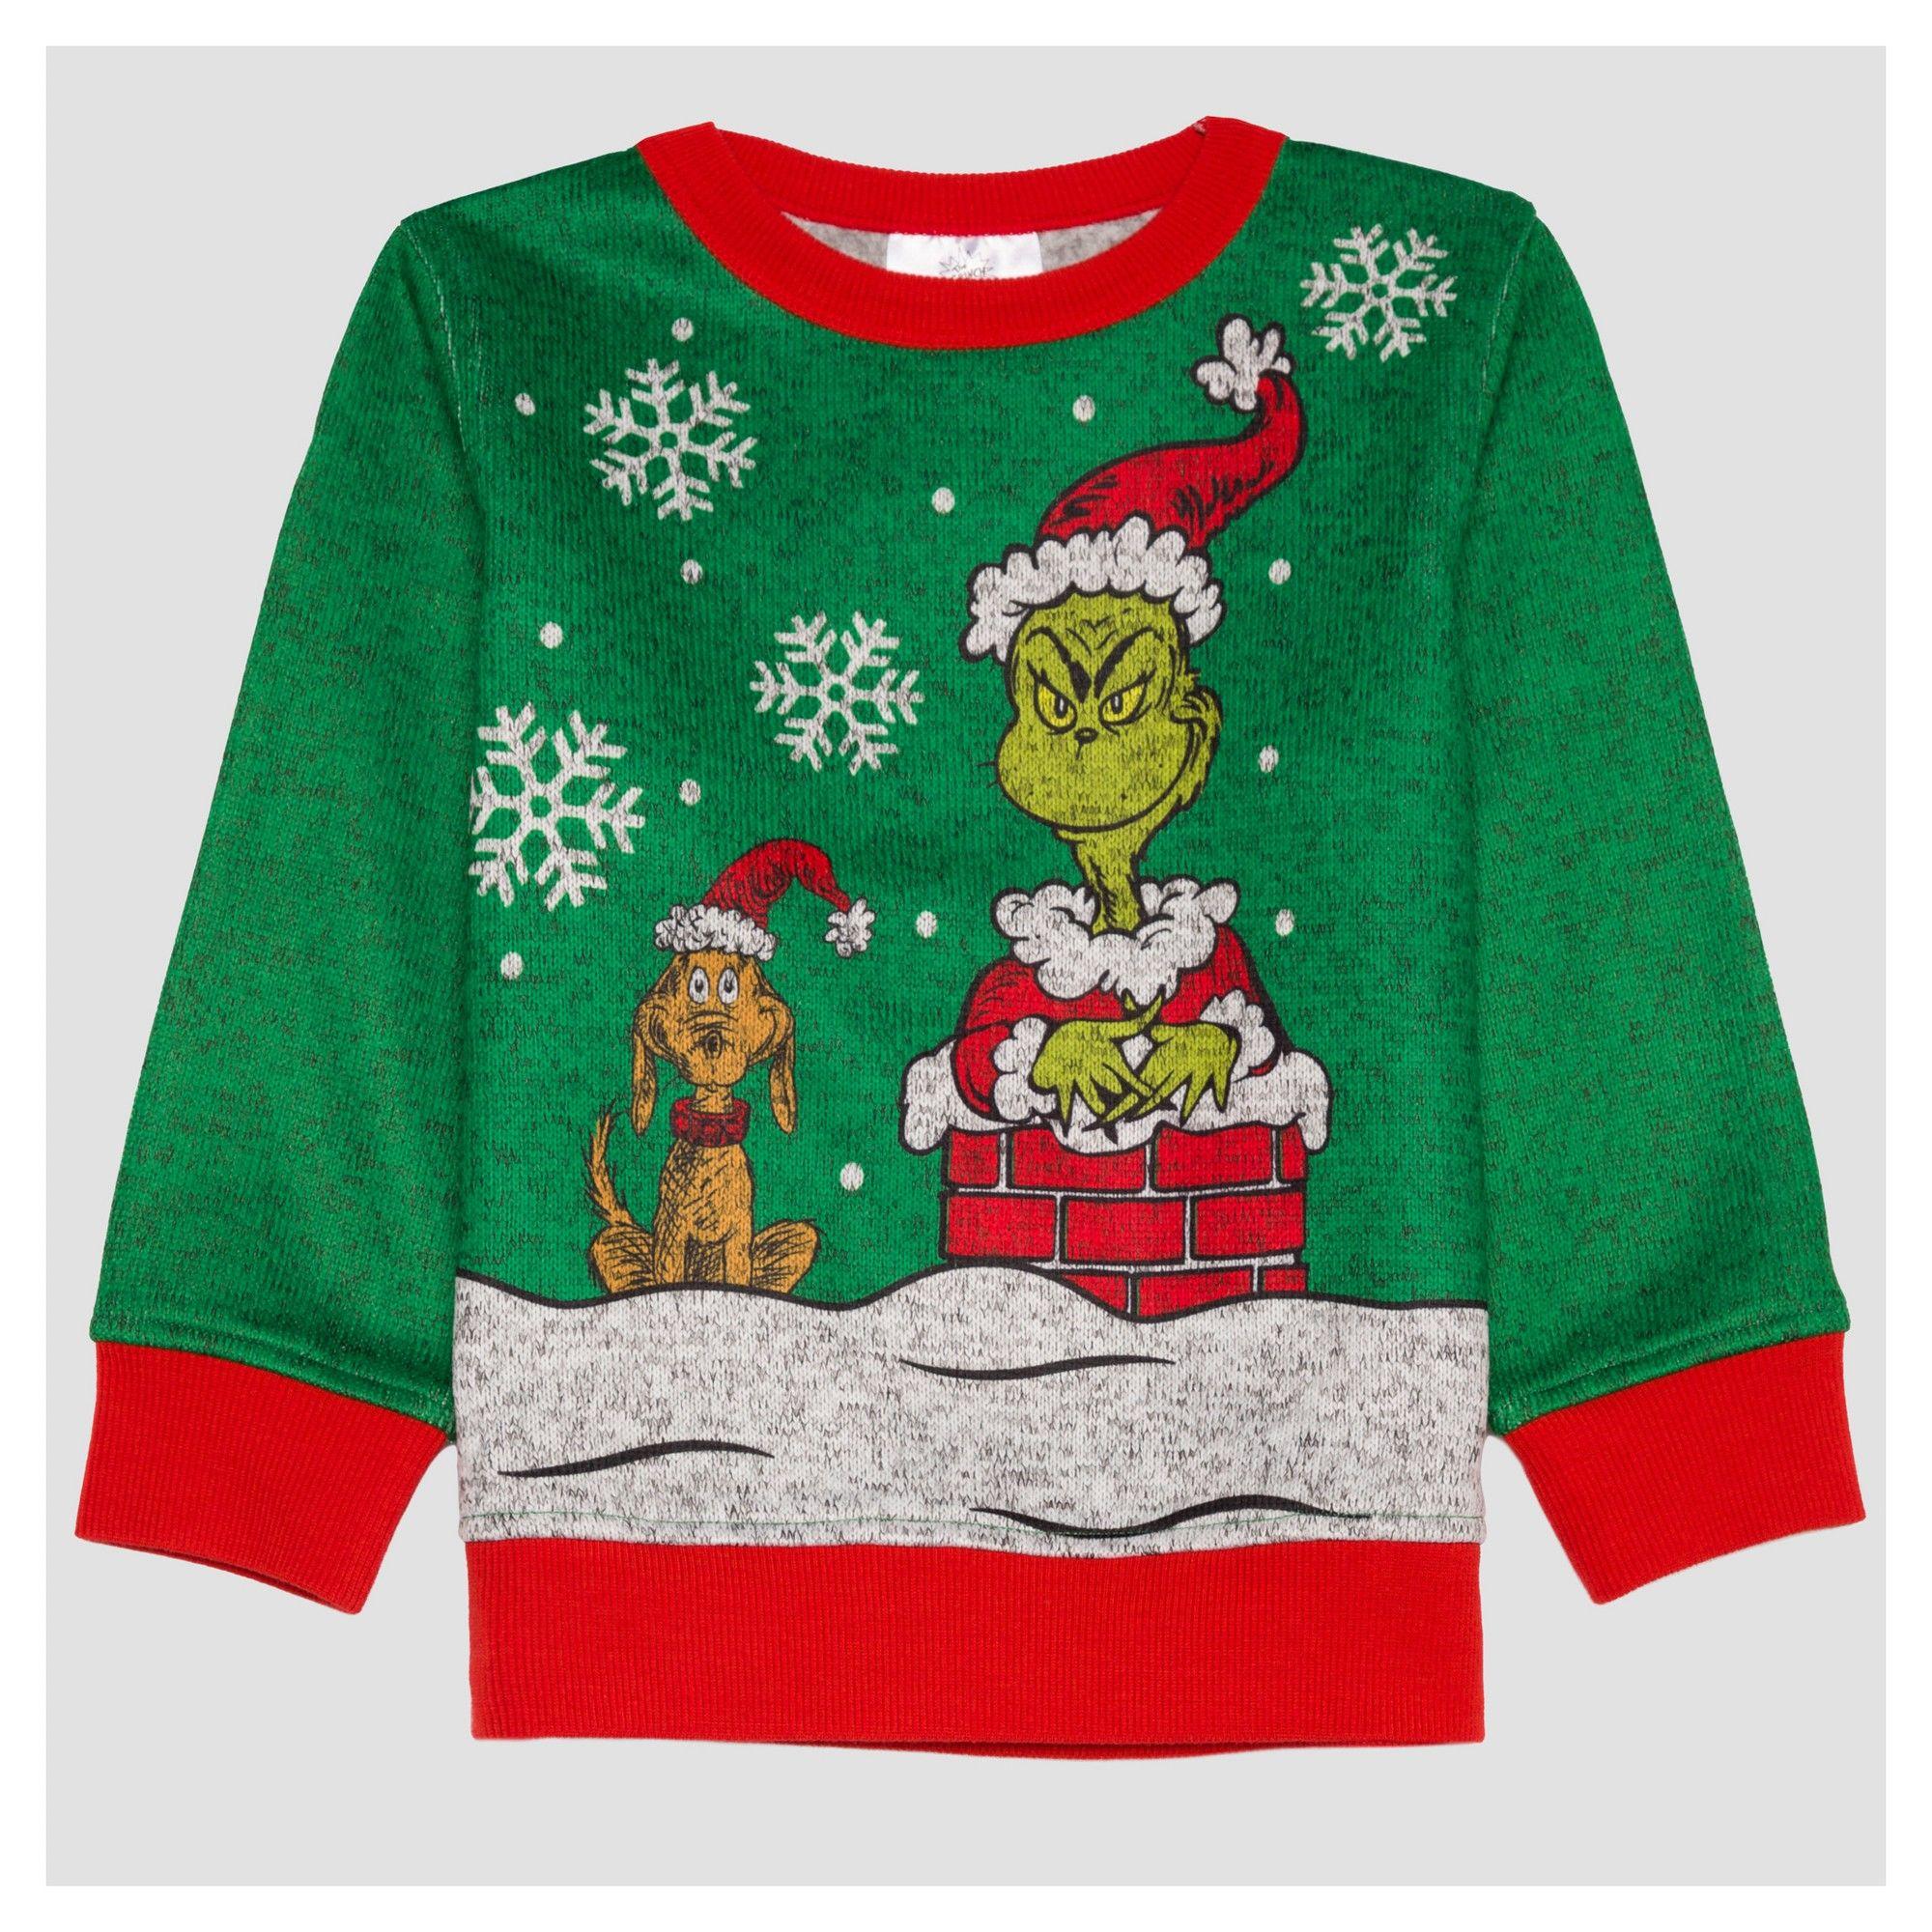 65a92296e8305b Dr. Seuss Toddler Boys' How the Grinch Stole Christmas Sweatshirt - Pepper  4T, Green